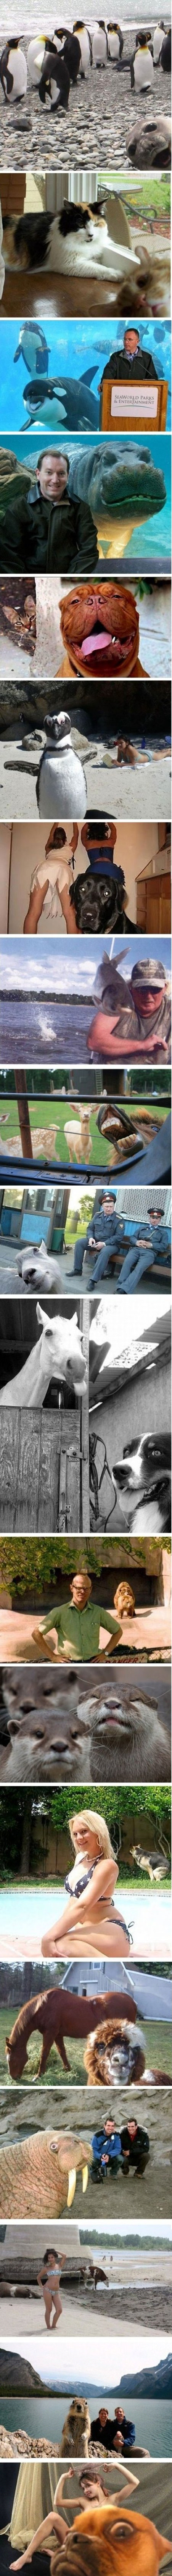 Photobombing Animals